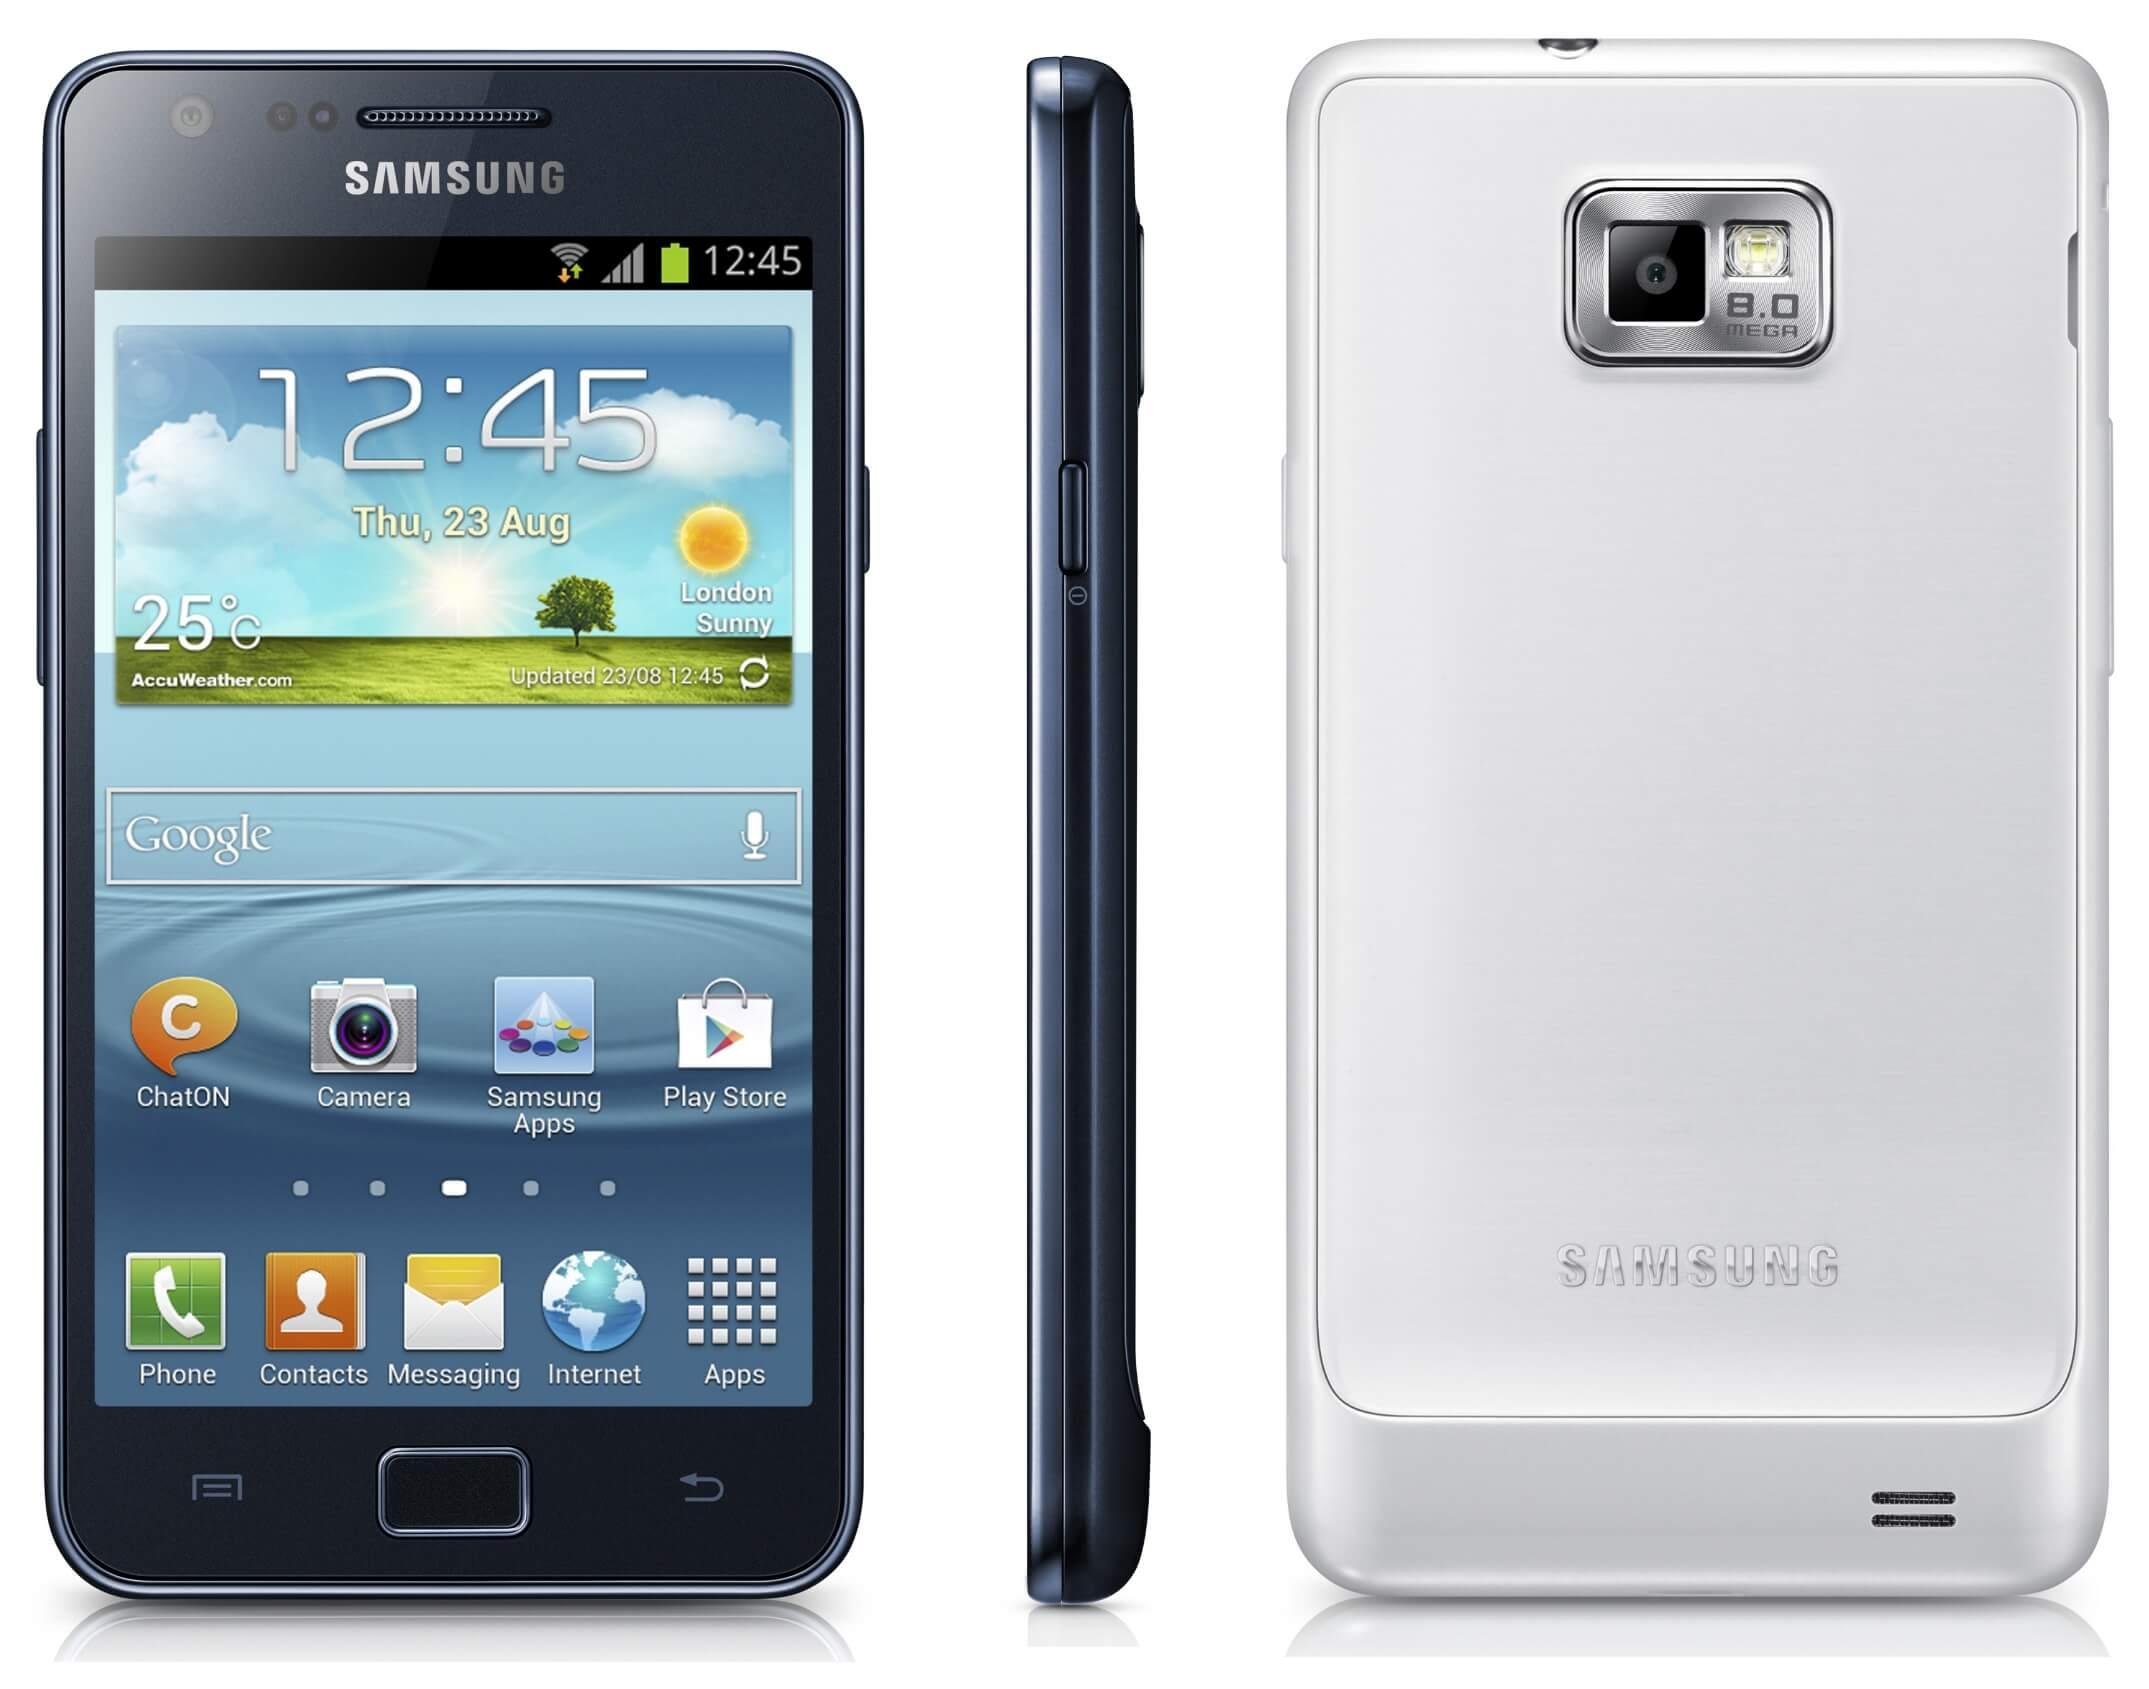 New cell phone battery for samsung ativ s gt i8750 i8750 omnia odyssey - Samsung I9105 Galaxy S Ii Plus Photo Jpg